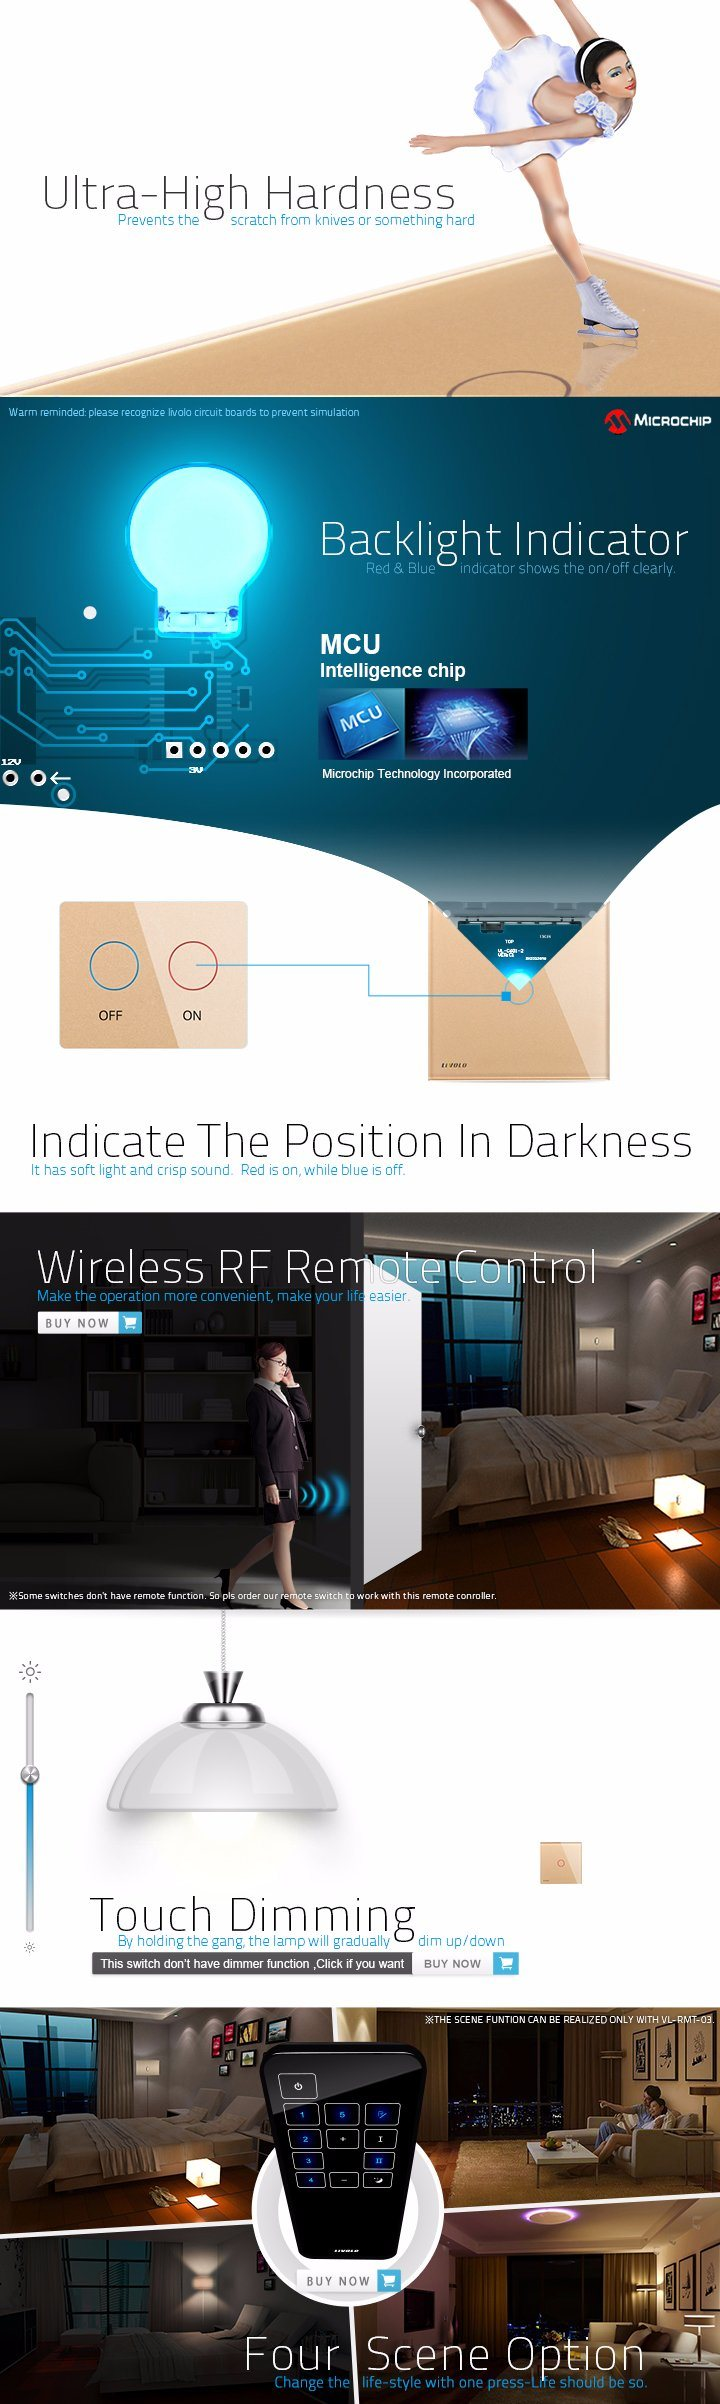 New Livolo Two Way Wall Light Switch Vl C301s 63 China With Indicator Faq